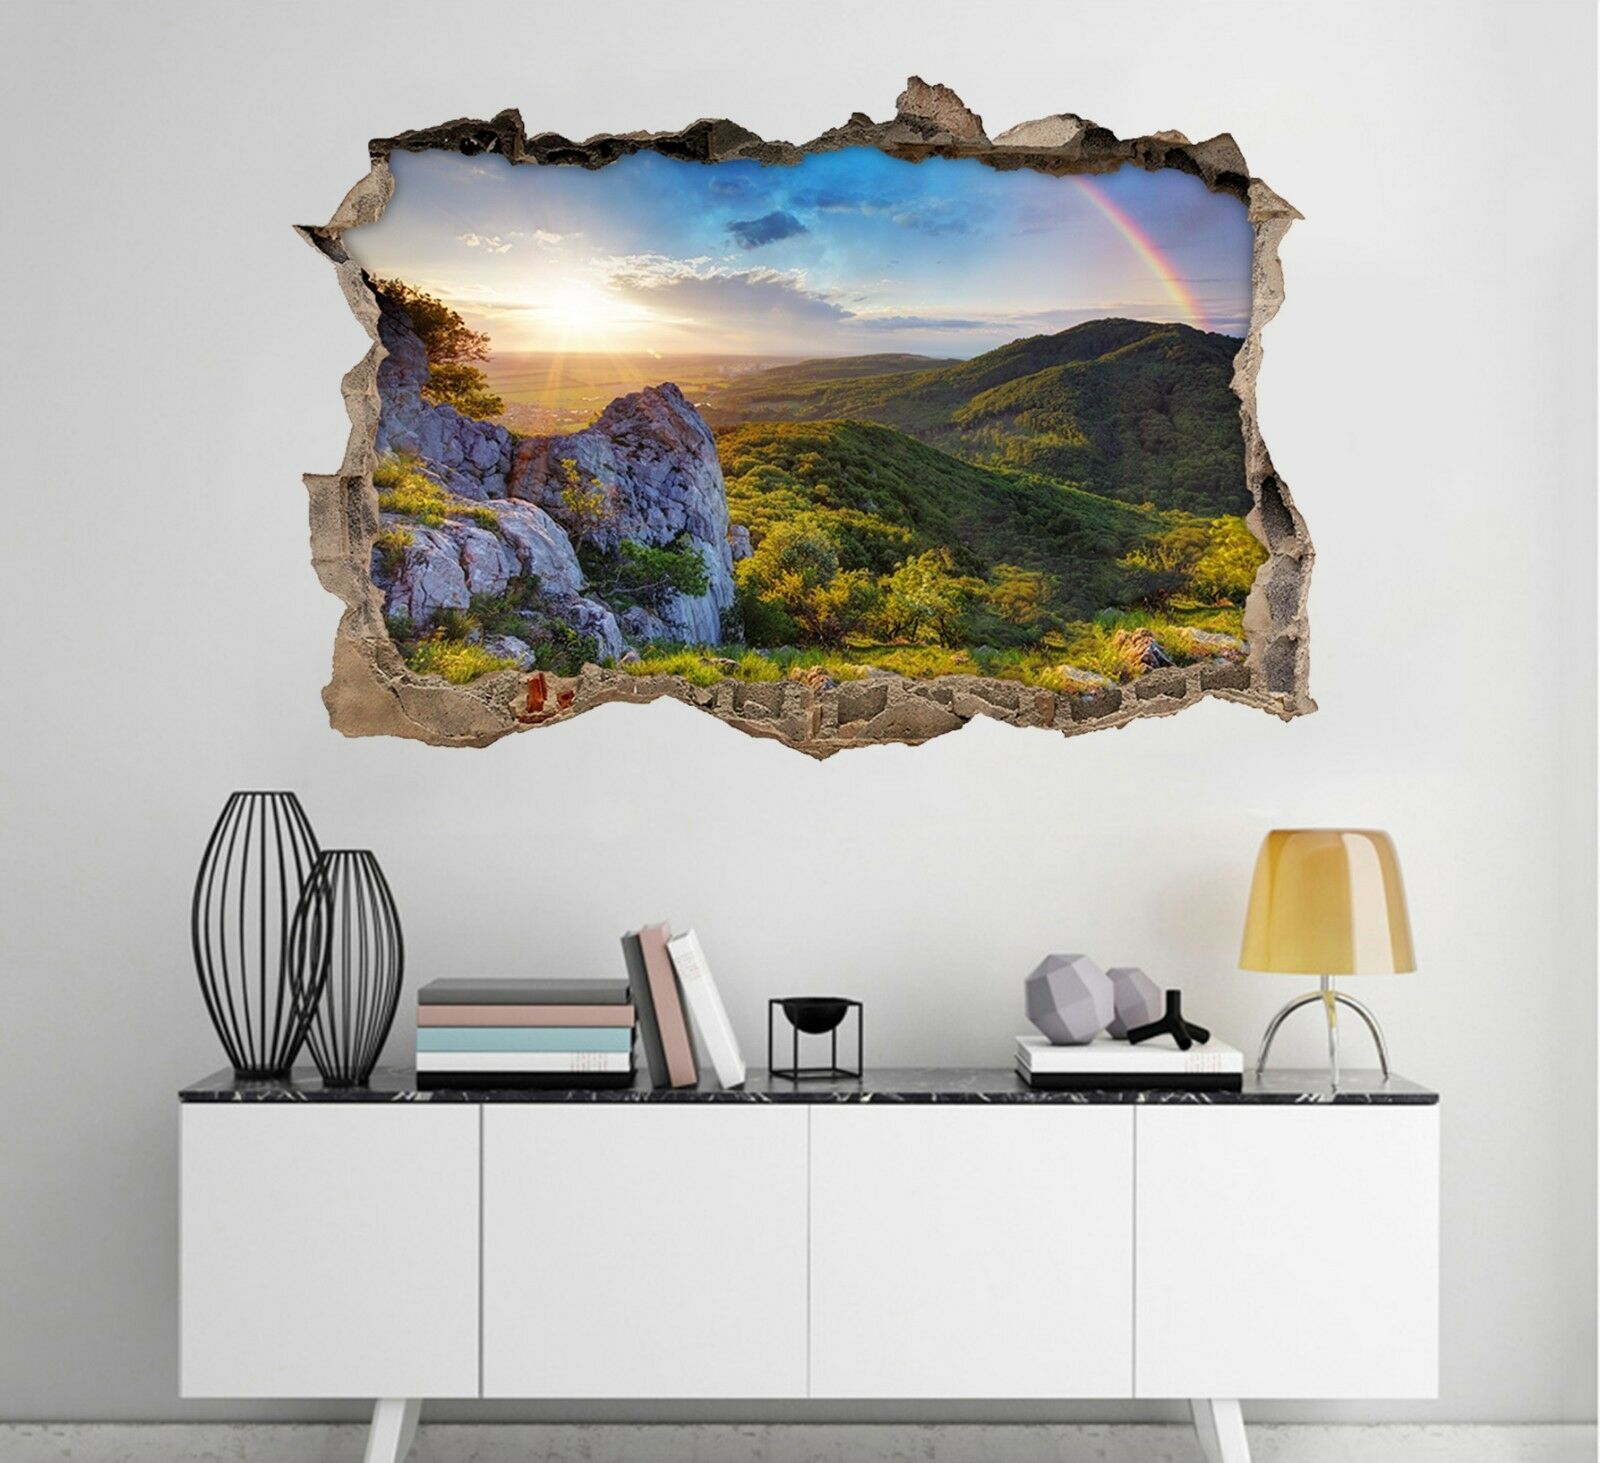 3D Montagna Arcobaleno Parete Murales Adesivi Decal Sfondamento AJ WALLPAPER IT